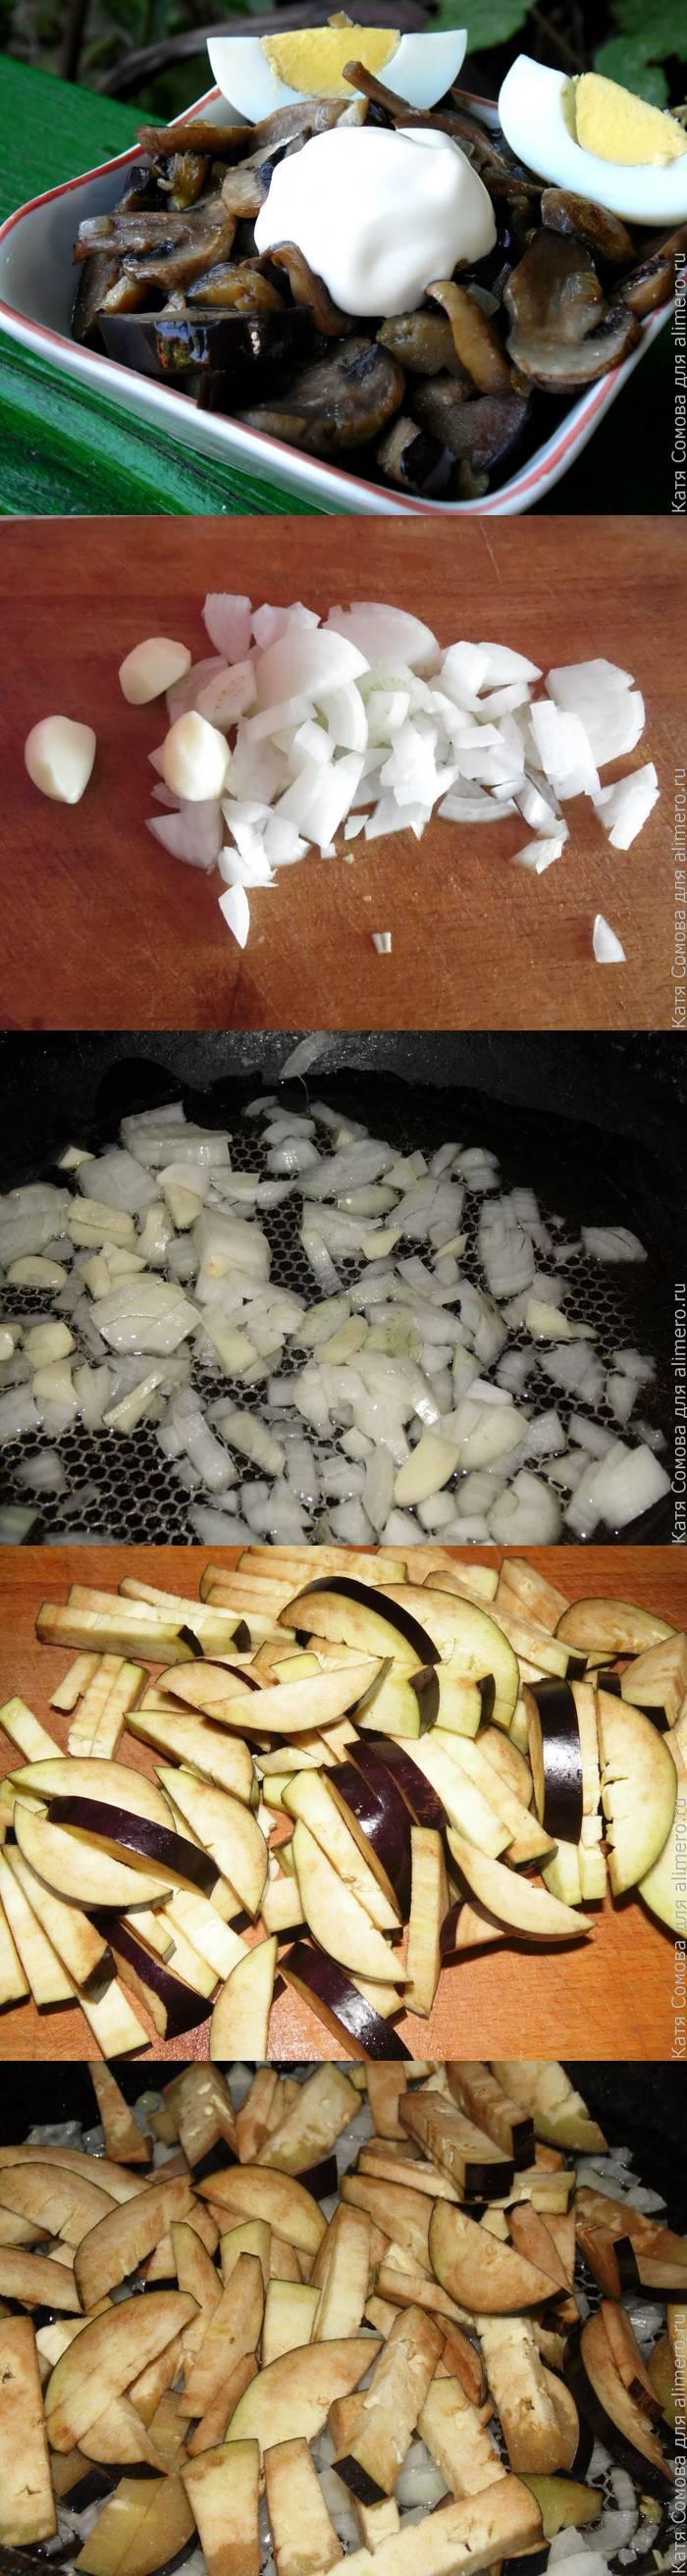 Теплая закуска из грибов и баклажан